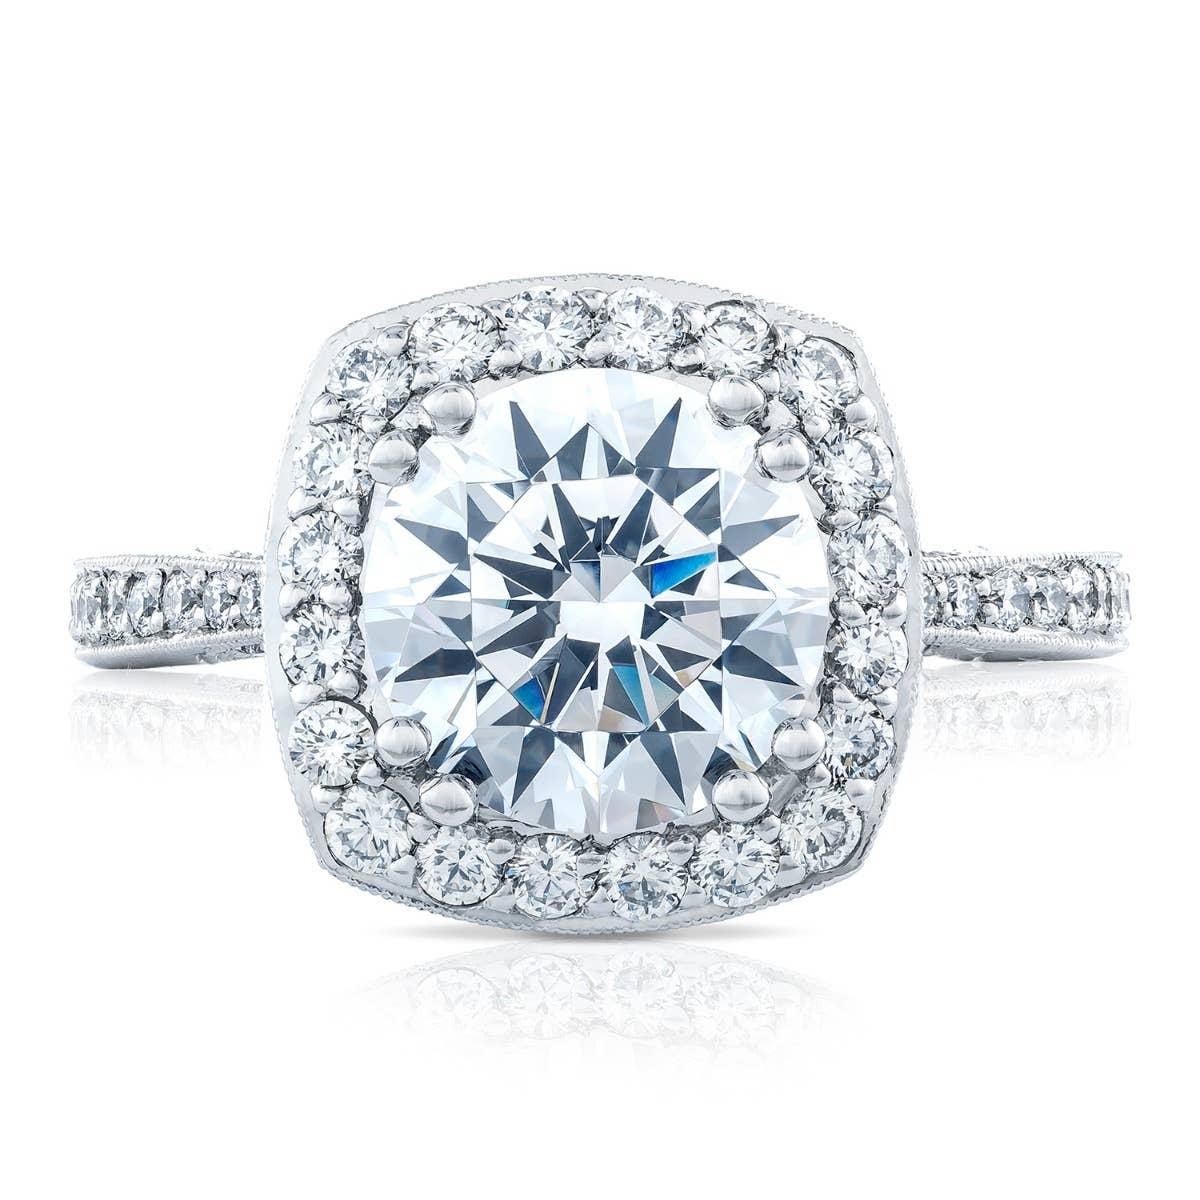 Tacori Engagement Rings - HT2652CU8